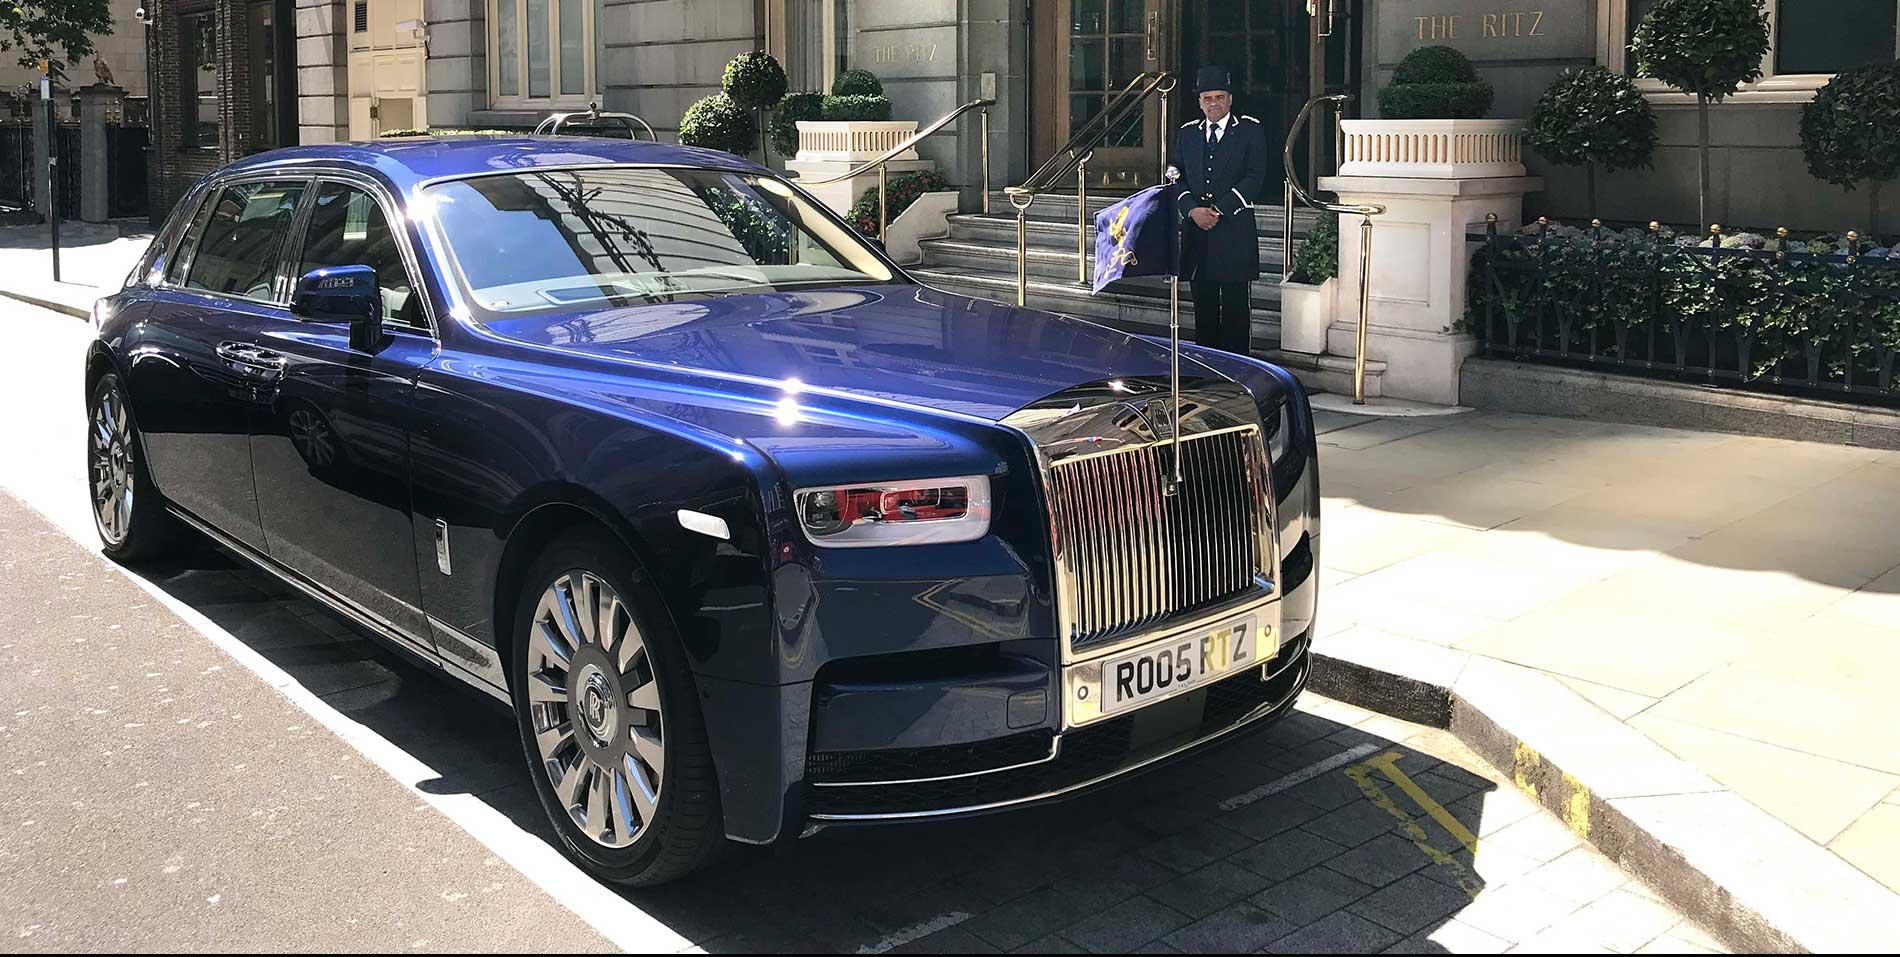 Ritz Rolls Royce